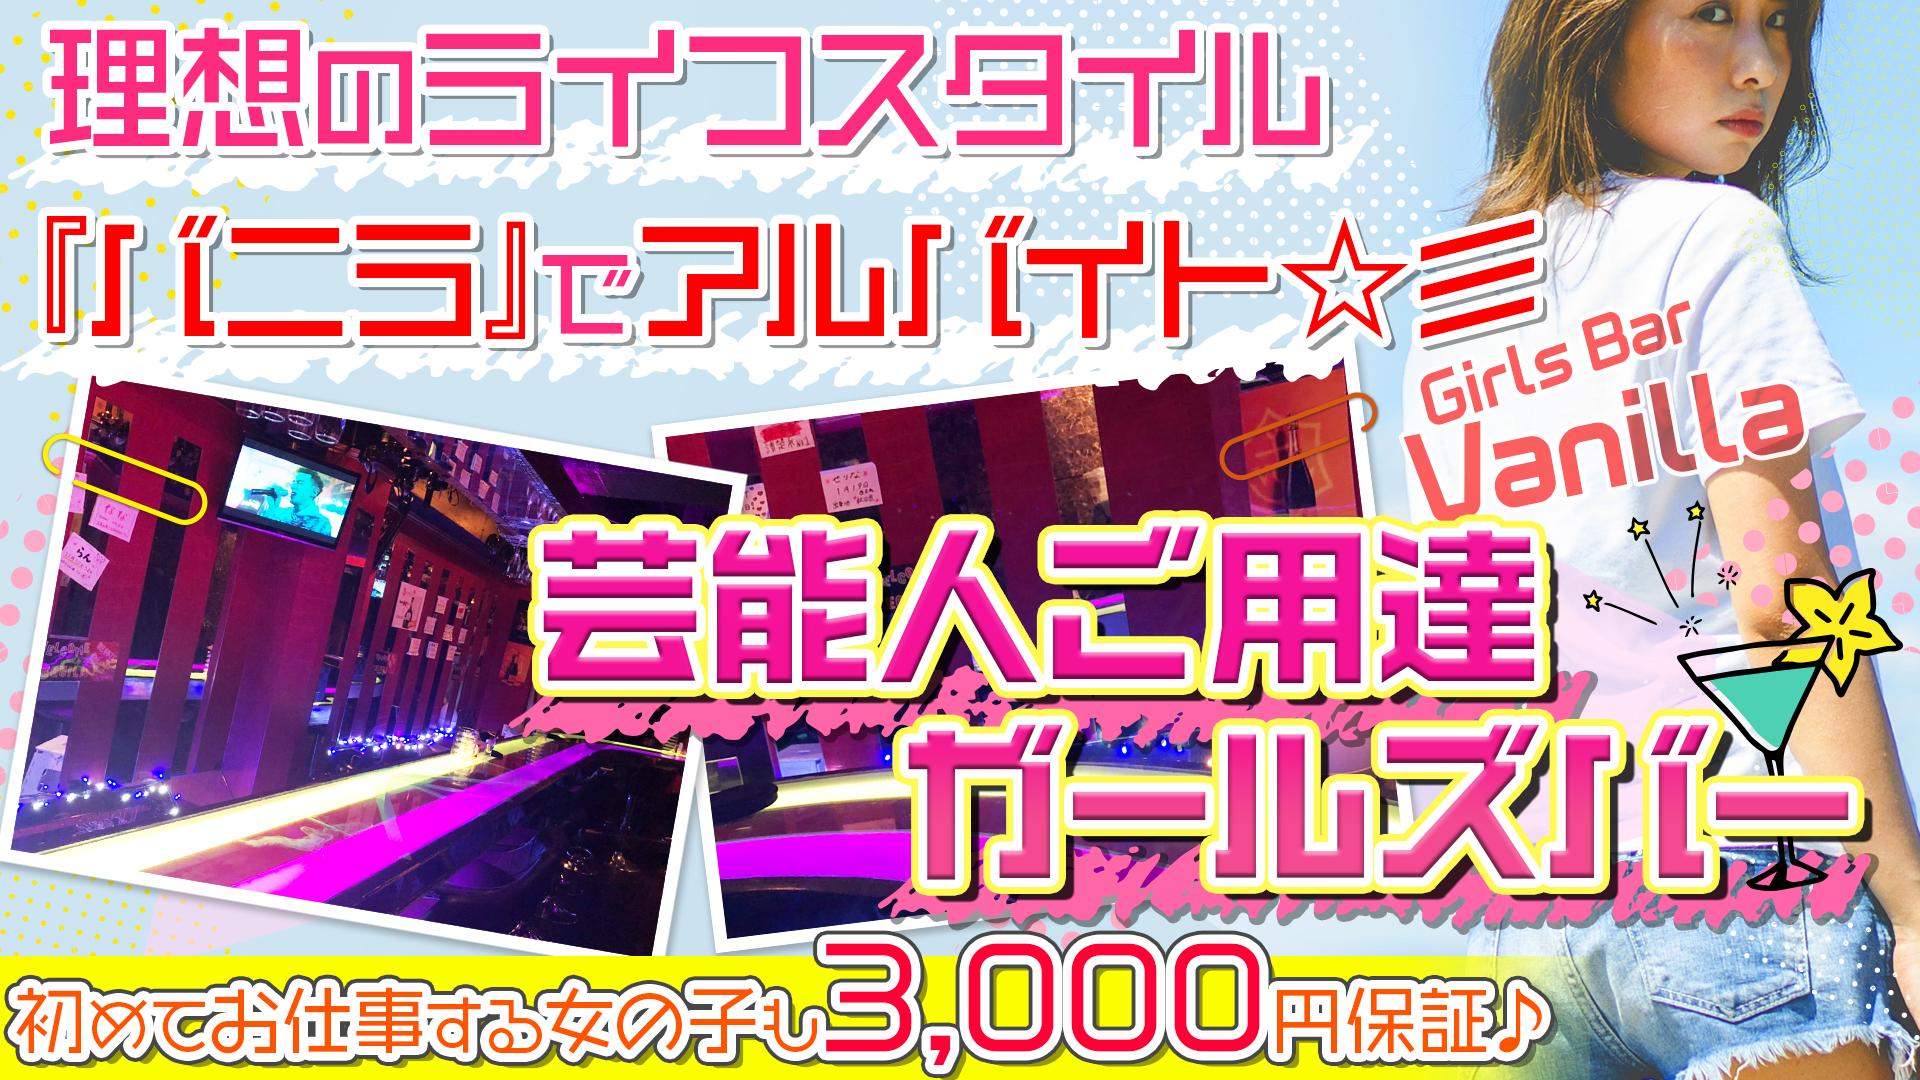 Girls Bar Vanilla<バニラ> 目黒 ガールズバー TOP画像